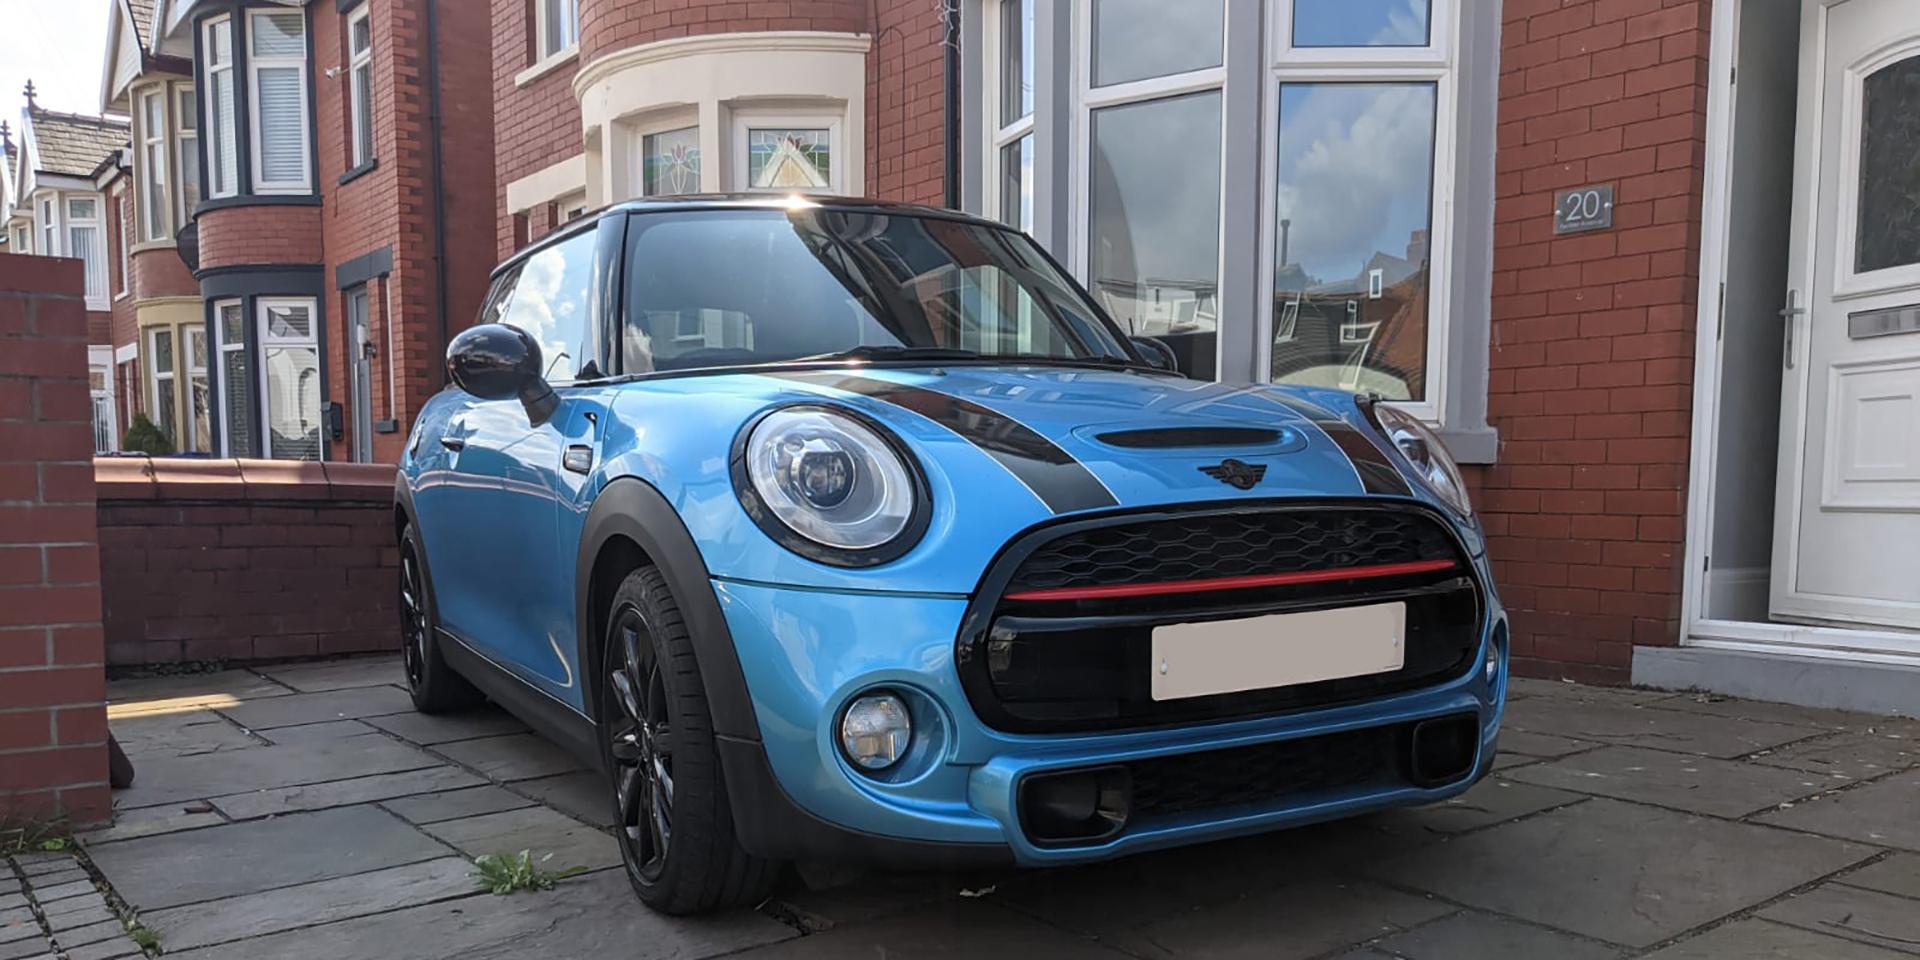 Subtle vehicle graphics & trim on a Mini Cooper